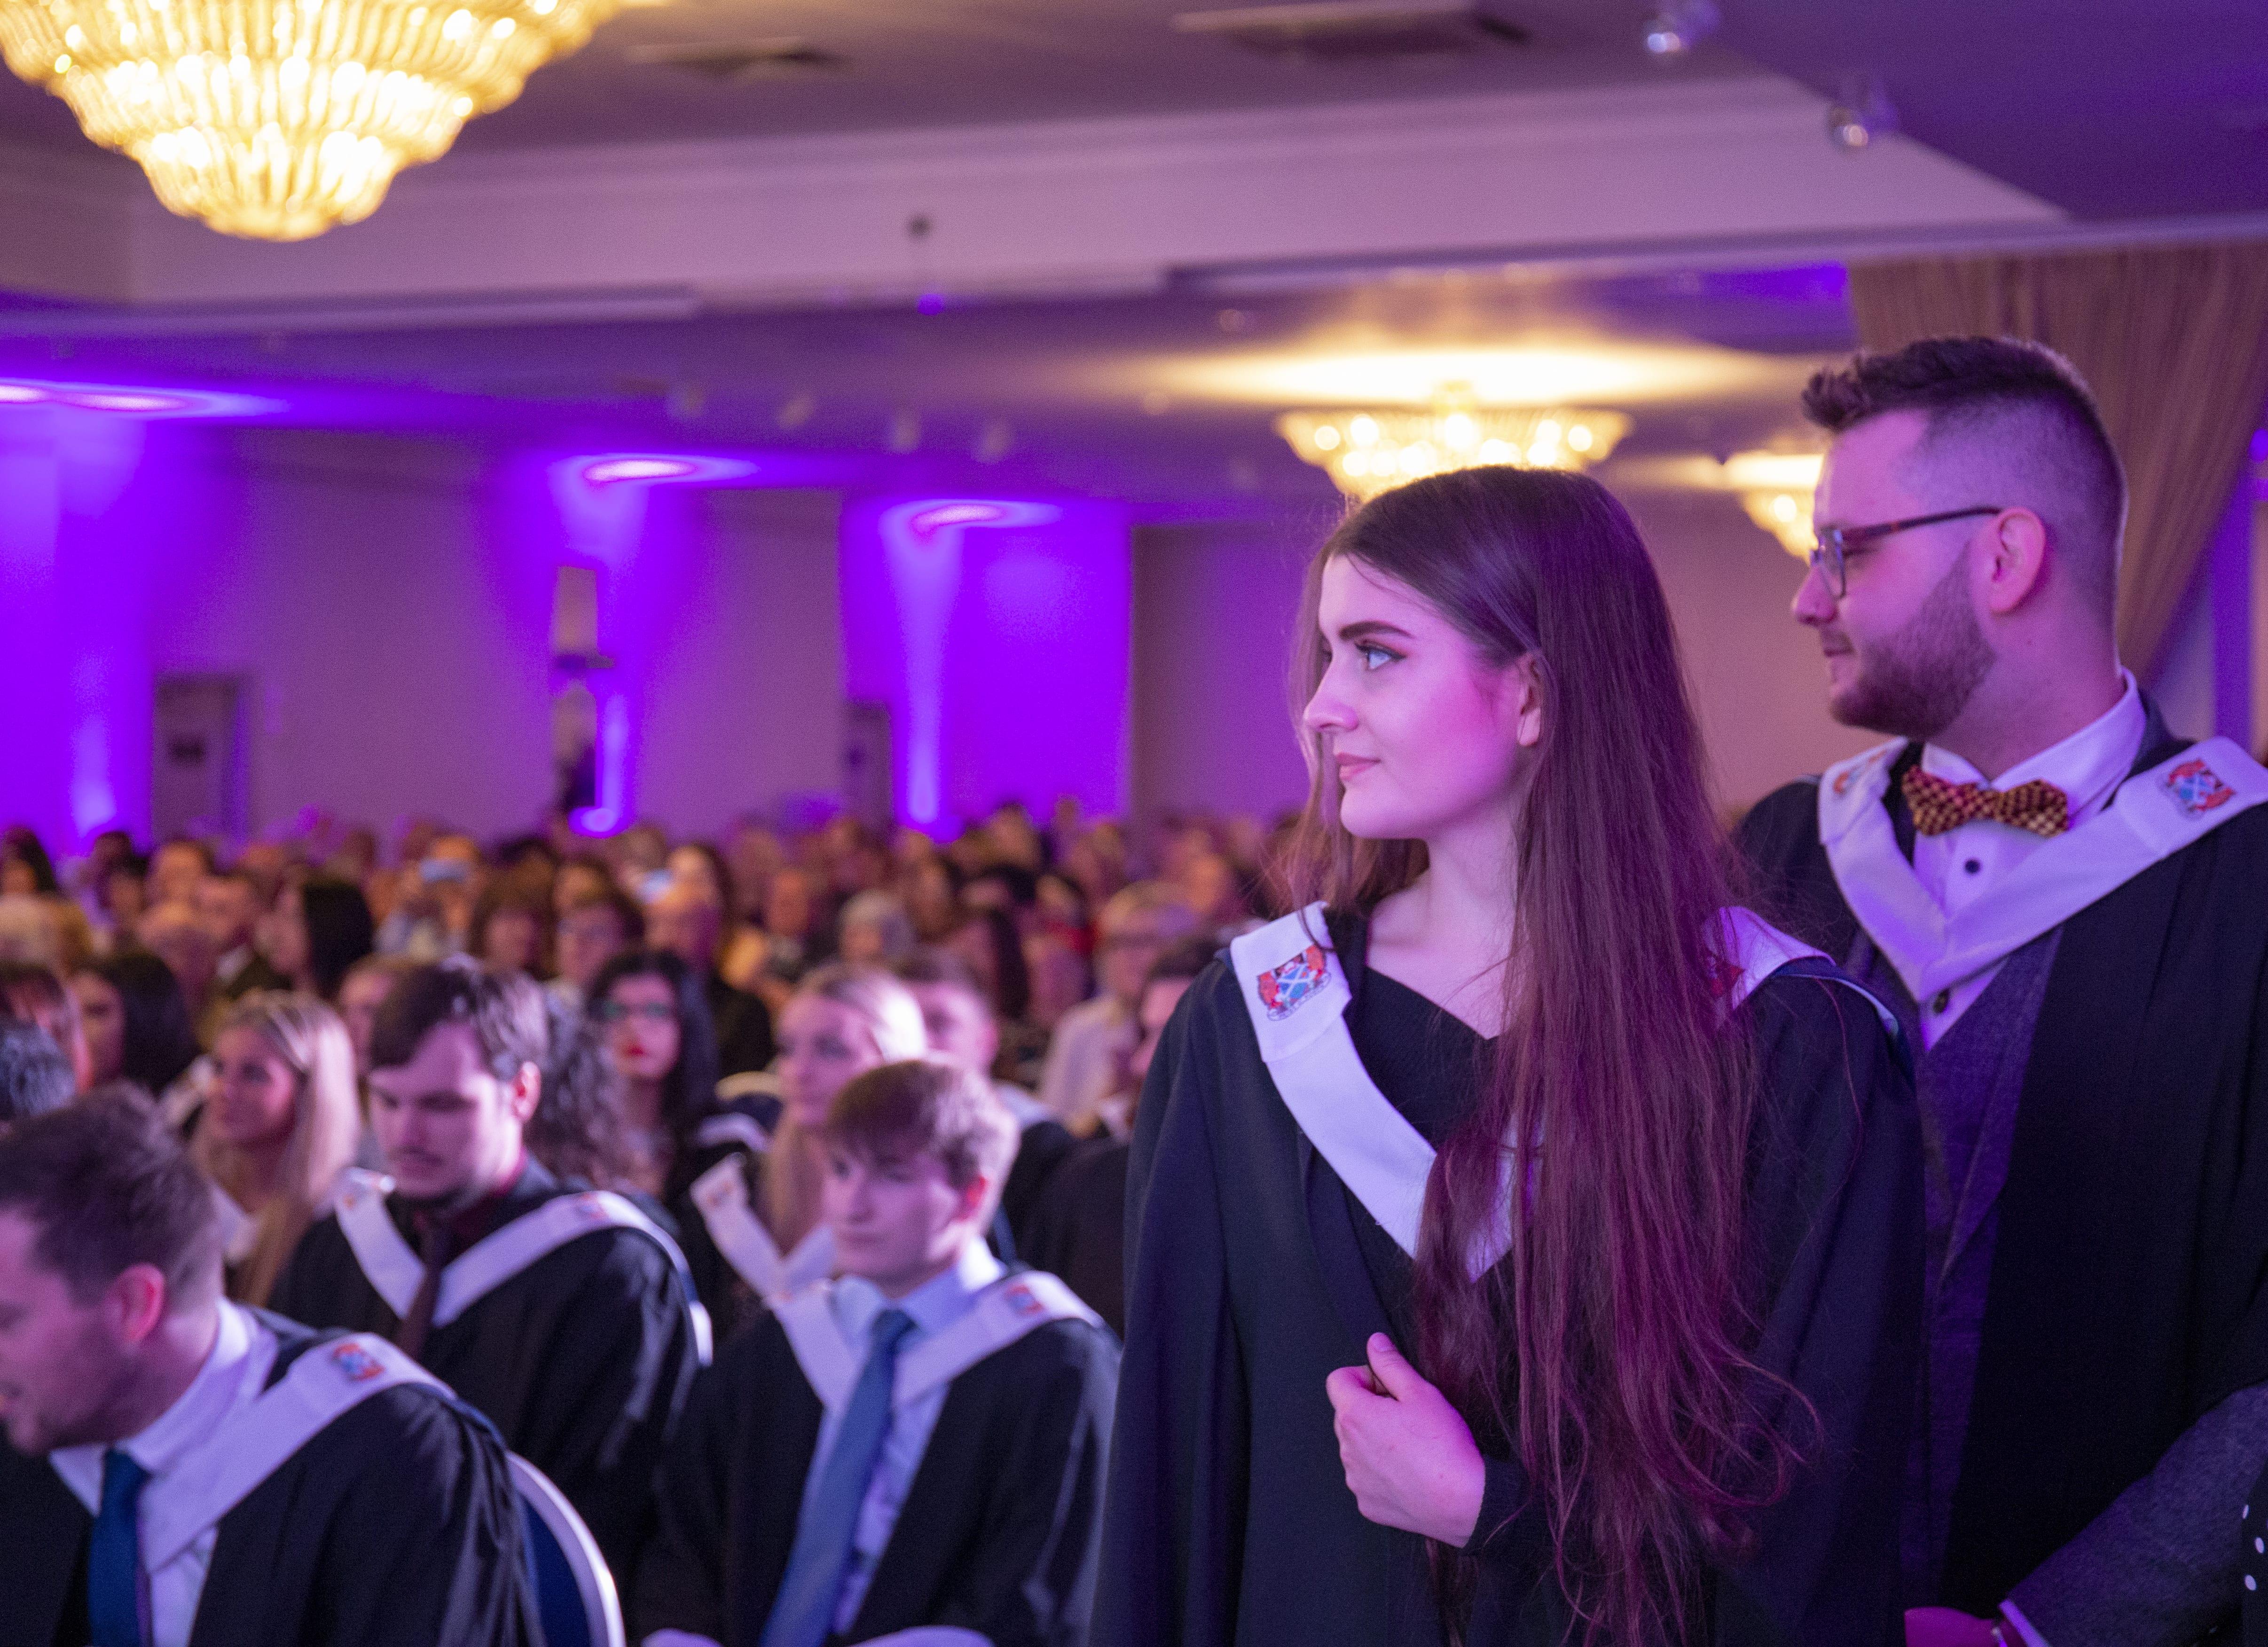 Aberdeen Awards ceremonies